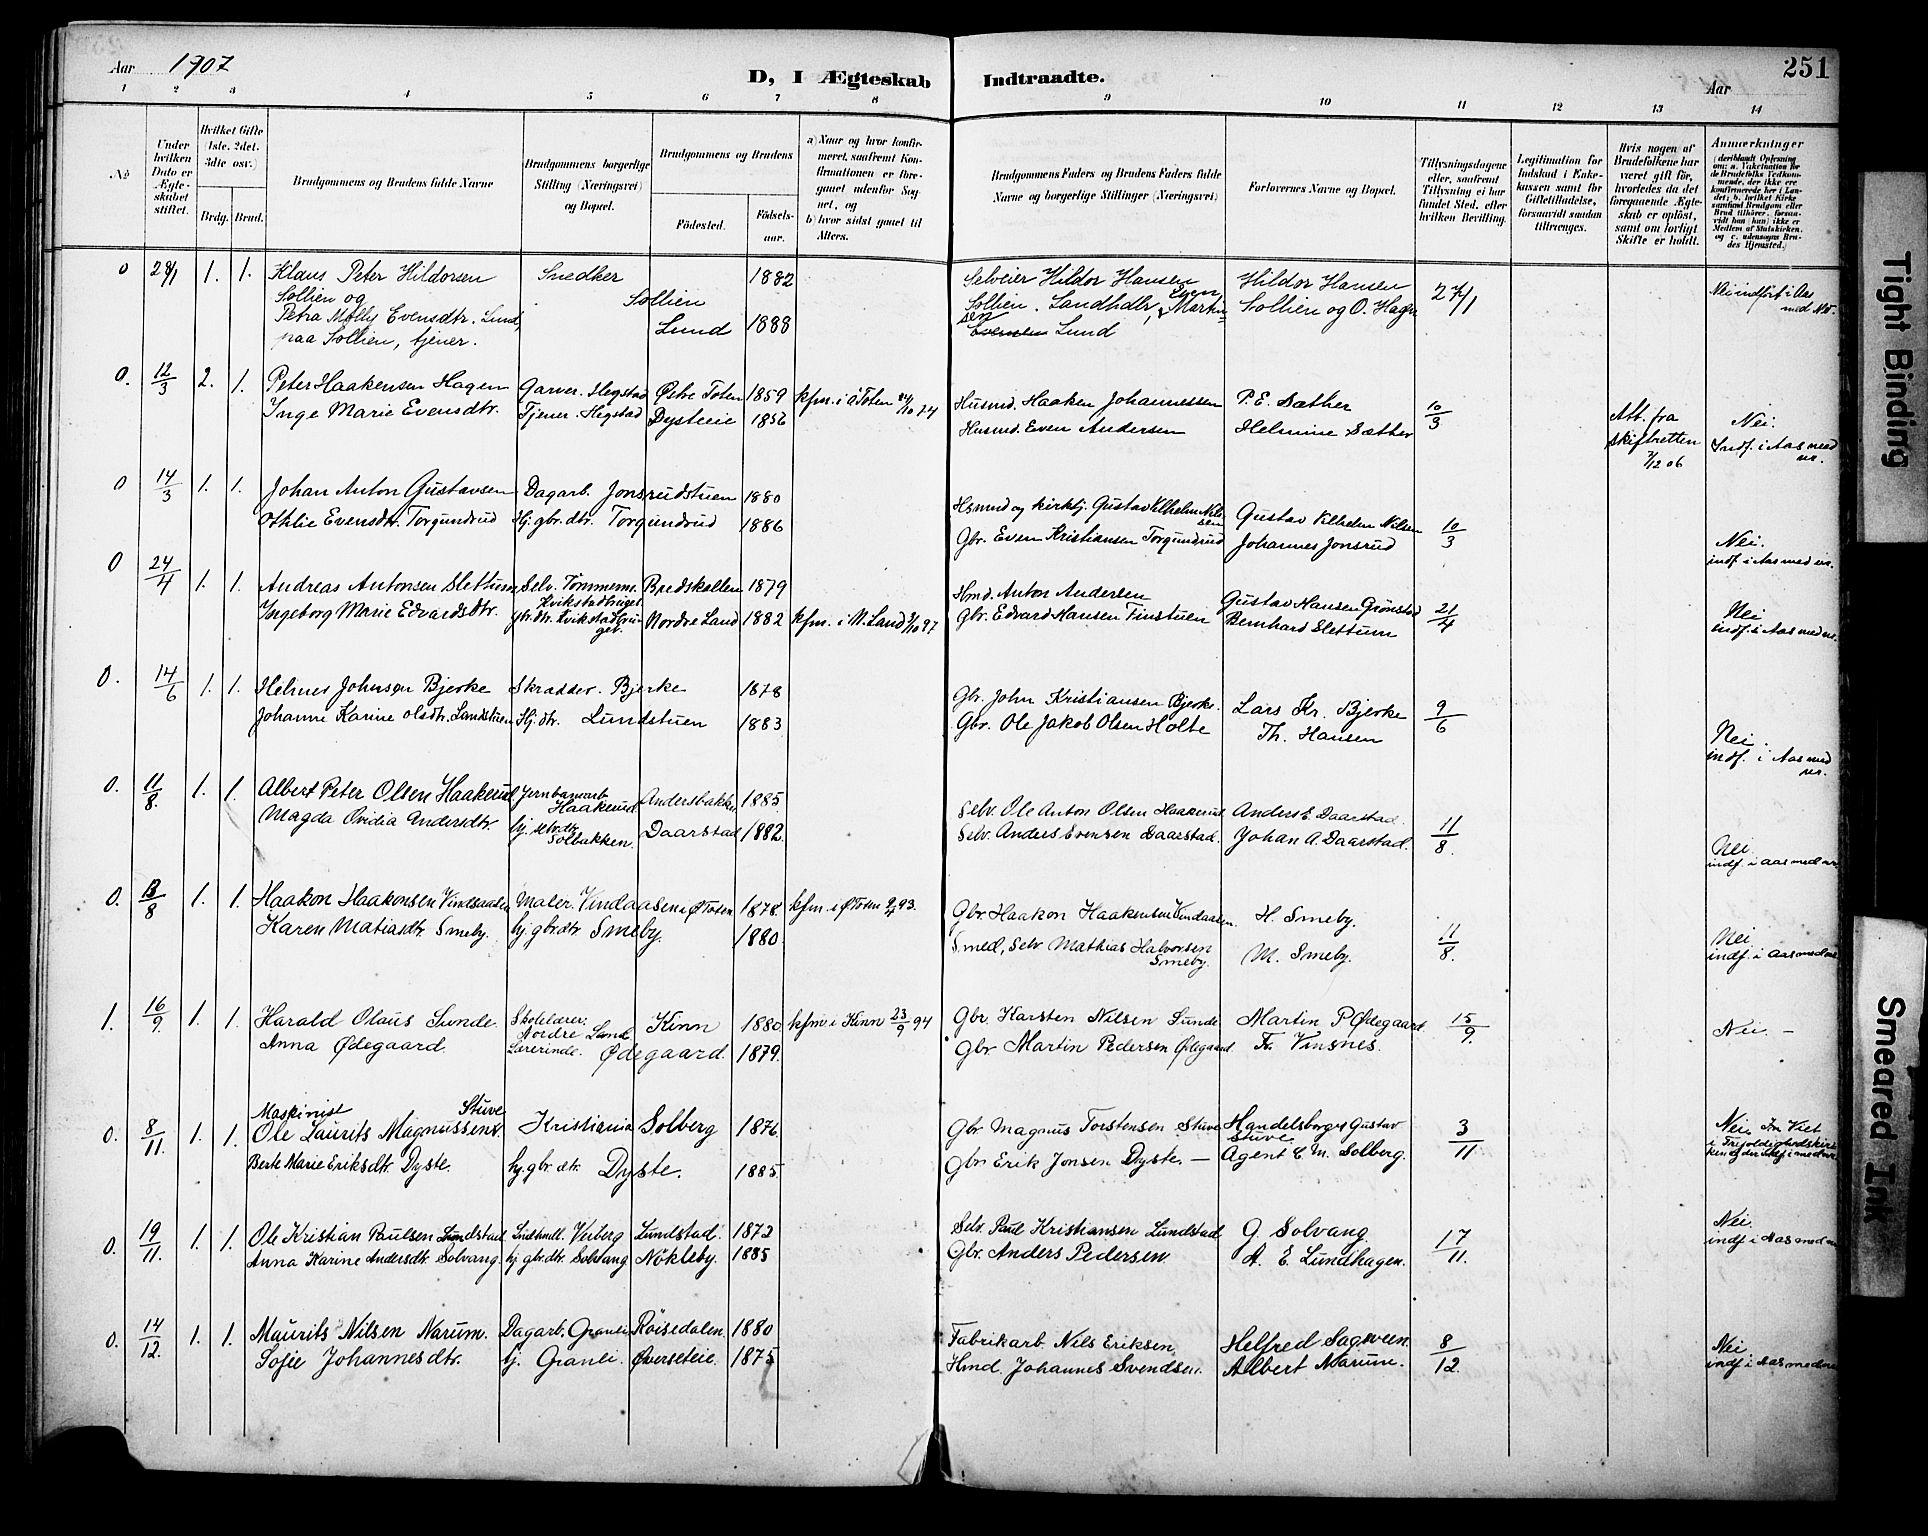 SAH, Vestre Toten prestekontor, H/Ha/Haa/L0013: Ministerialbok nr. 13, 1895-1911, s. 251